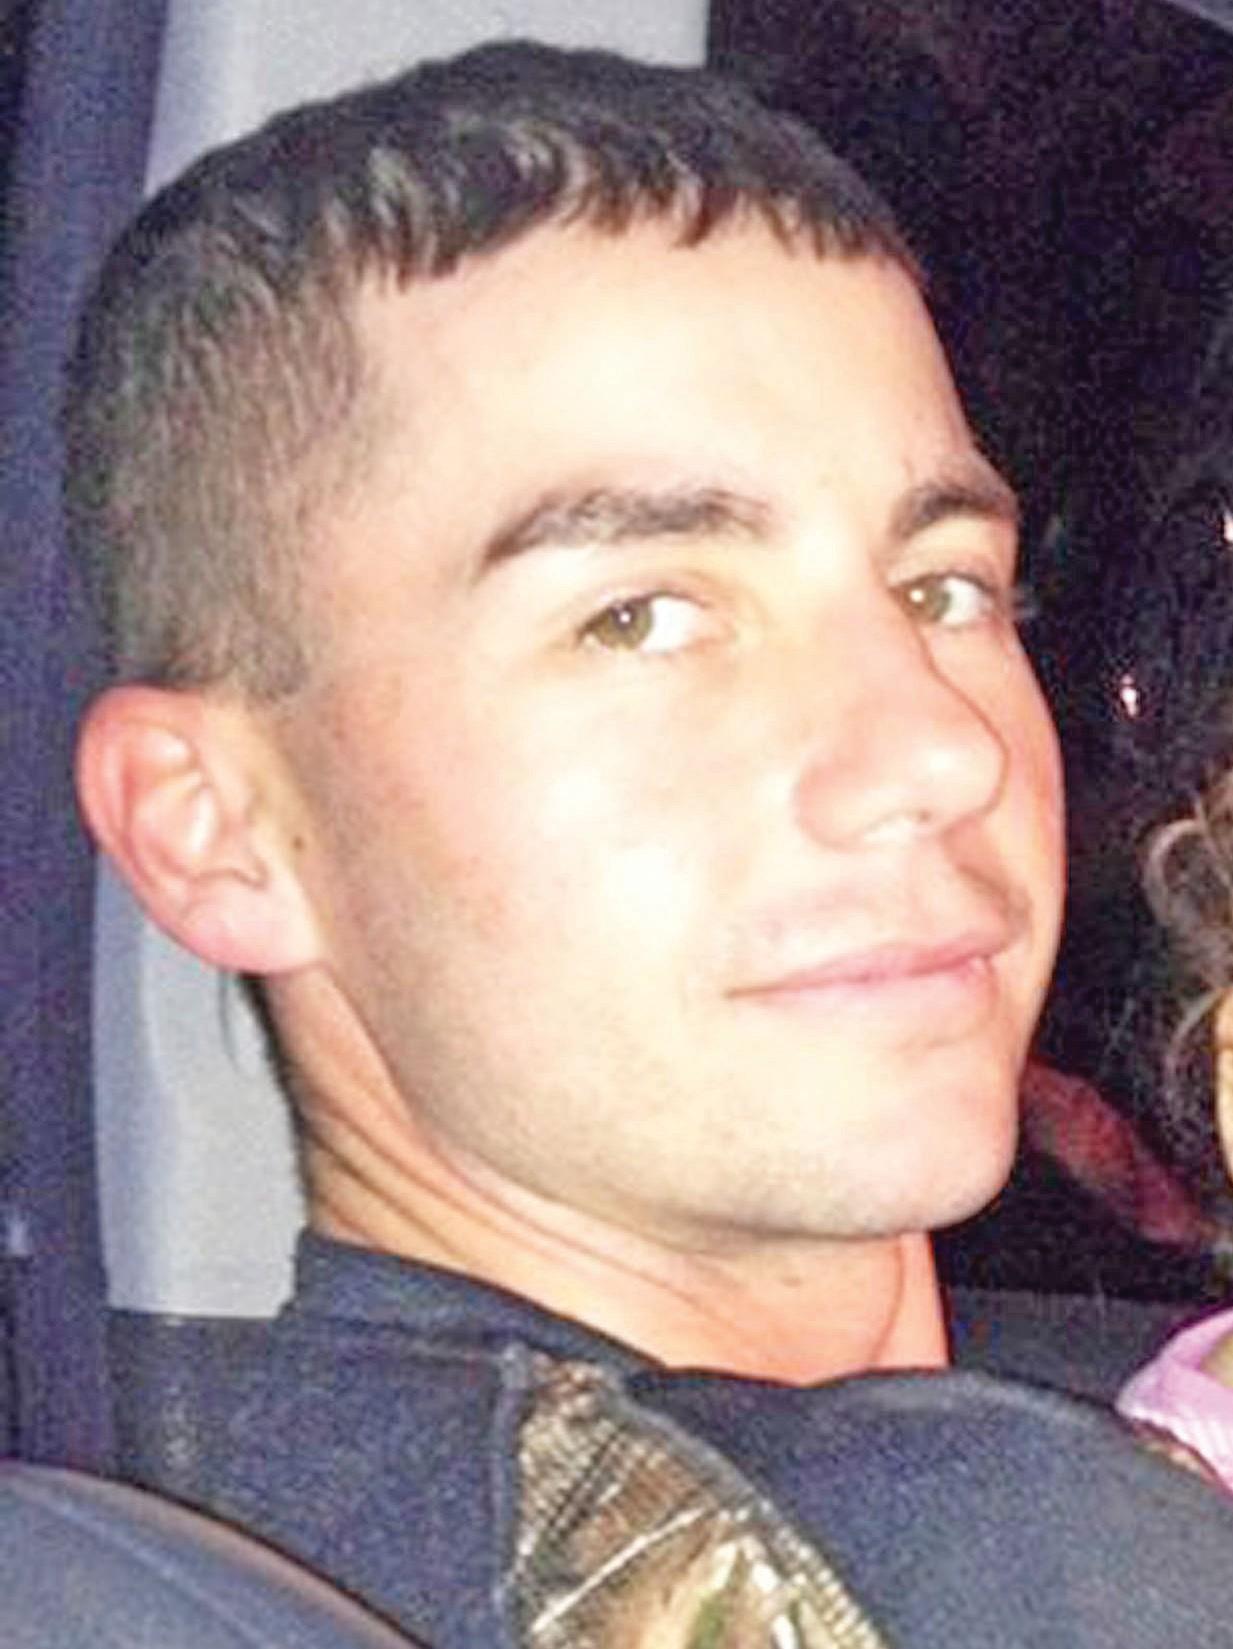 Christopher Ryan Harrell's body was found on November 10, 2015 in Medina County.